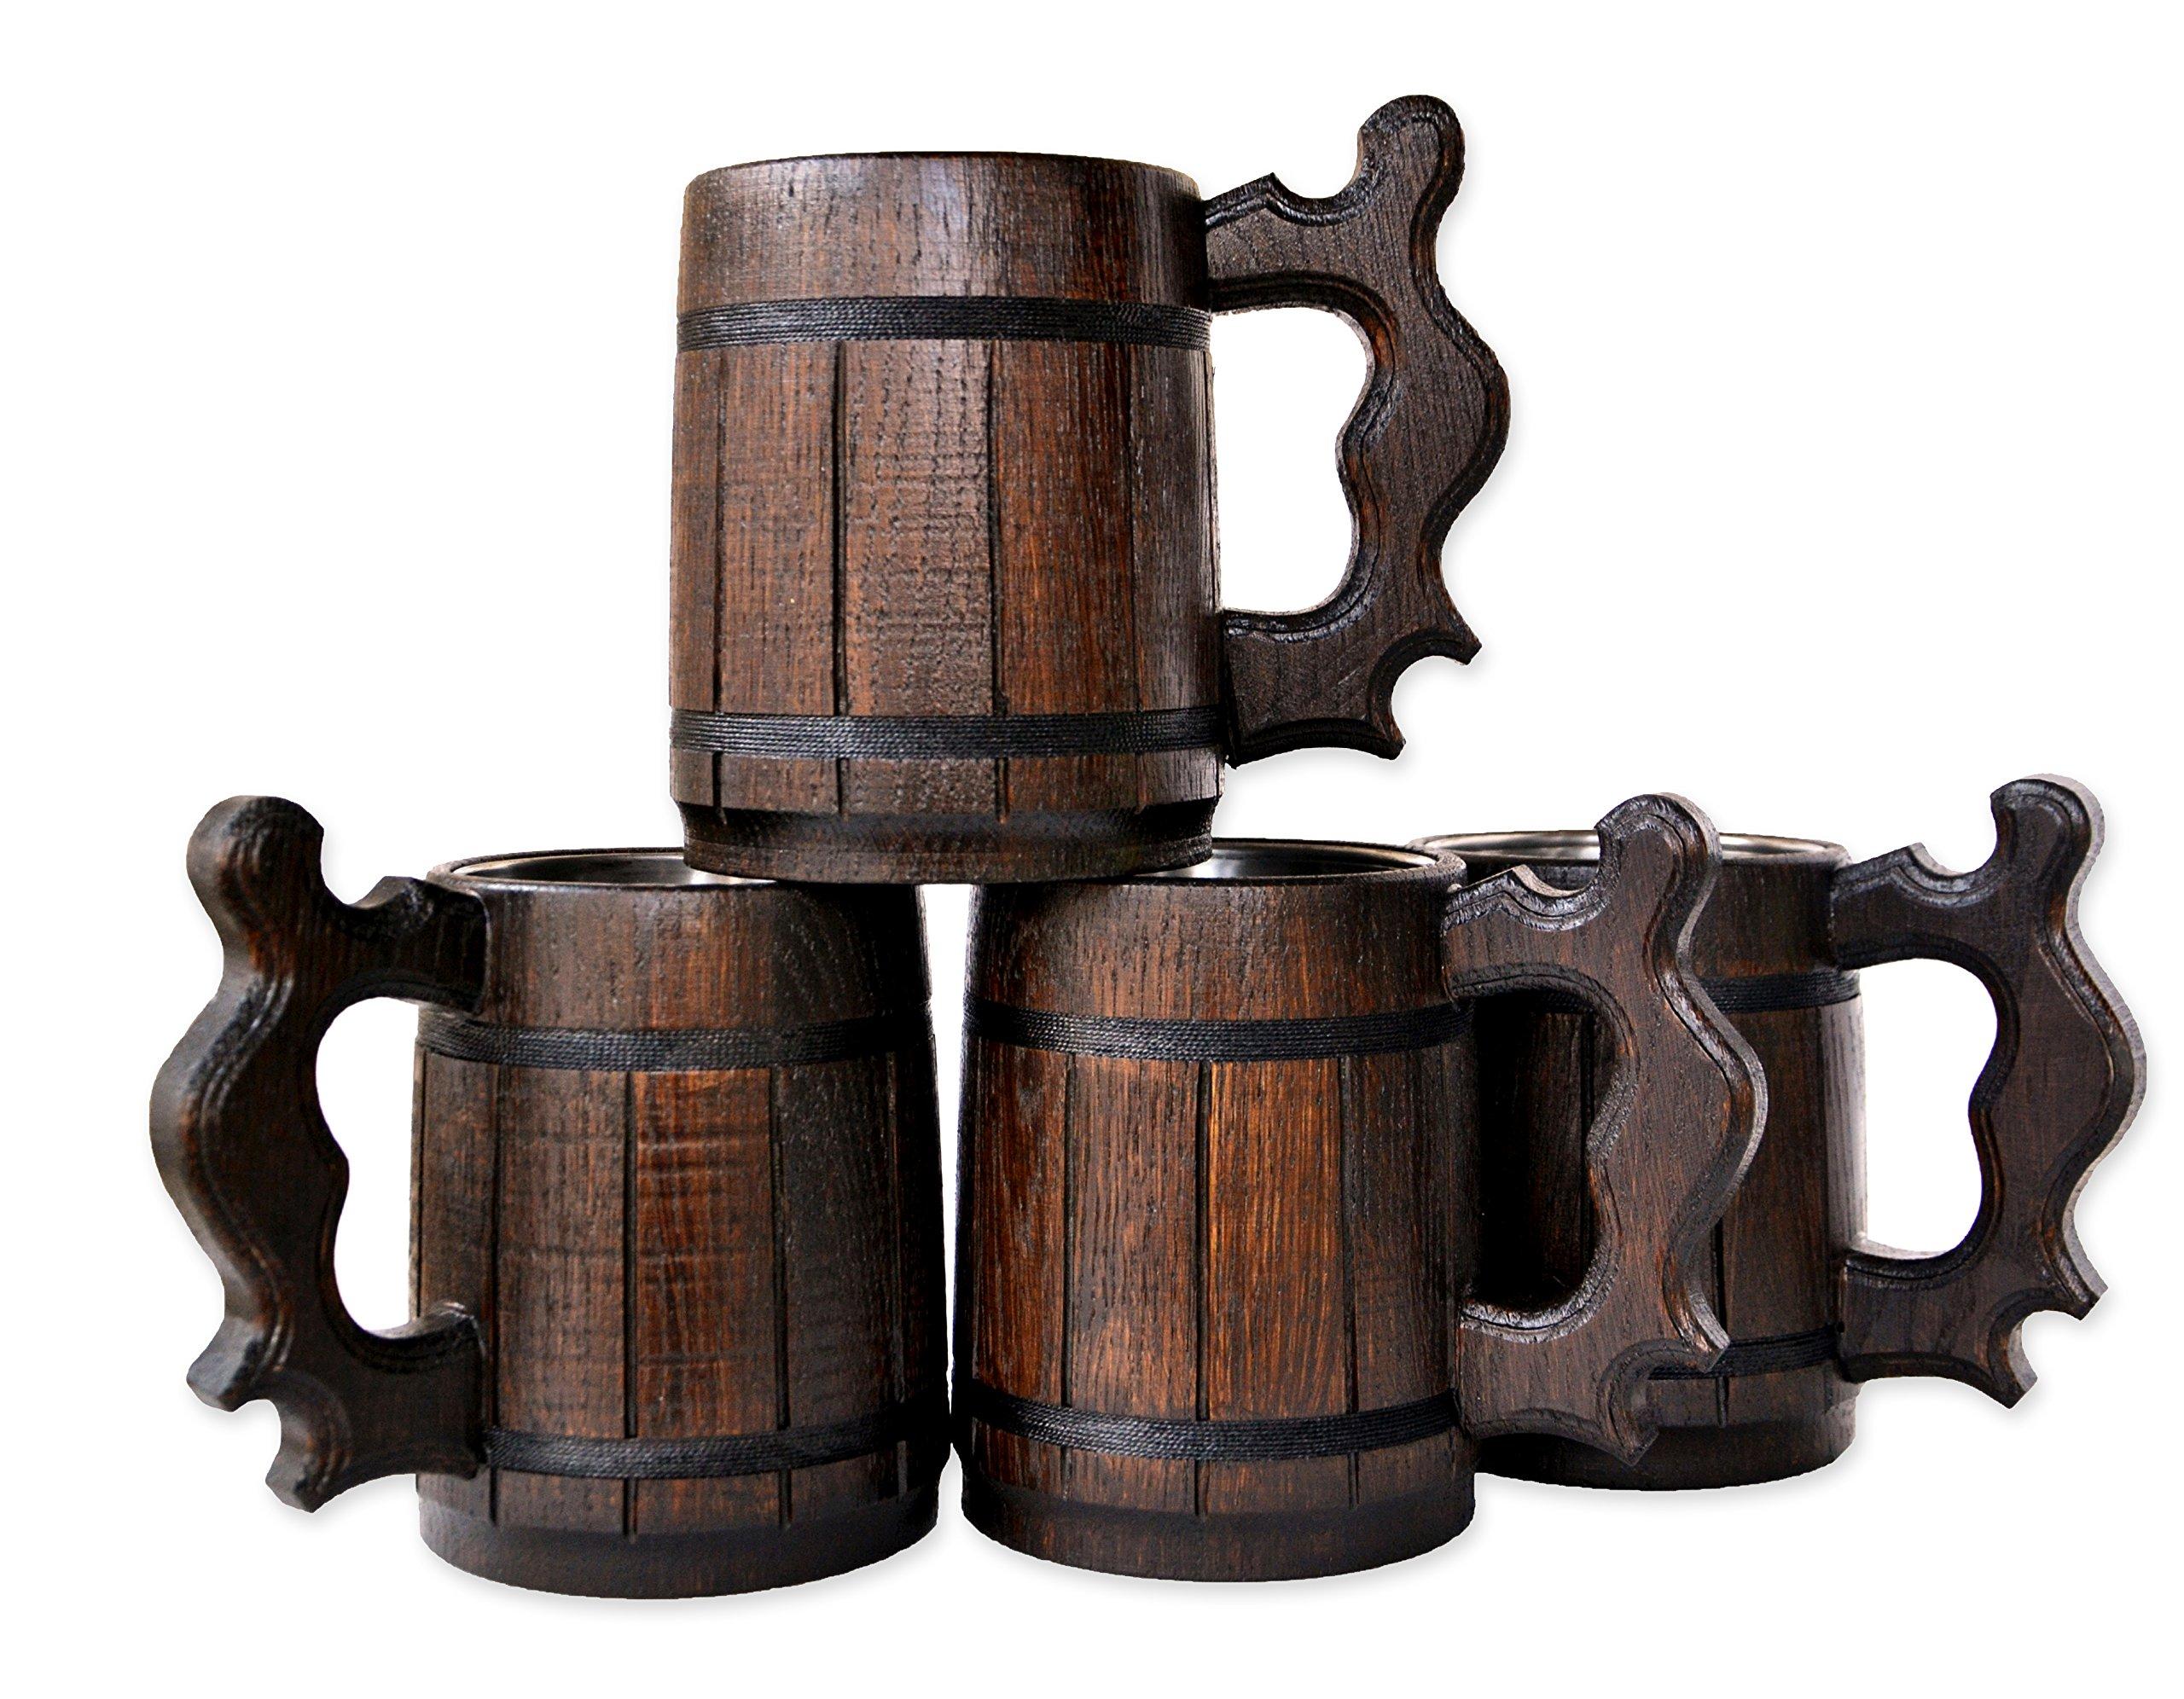 Handmade Beer Mug Set of 4 Oak Wood Stainless Steel Cup Gift Natural Eco-Friendly 0.6L 20oz Classic Brown